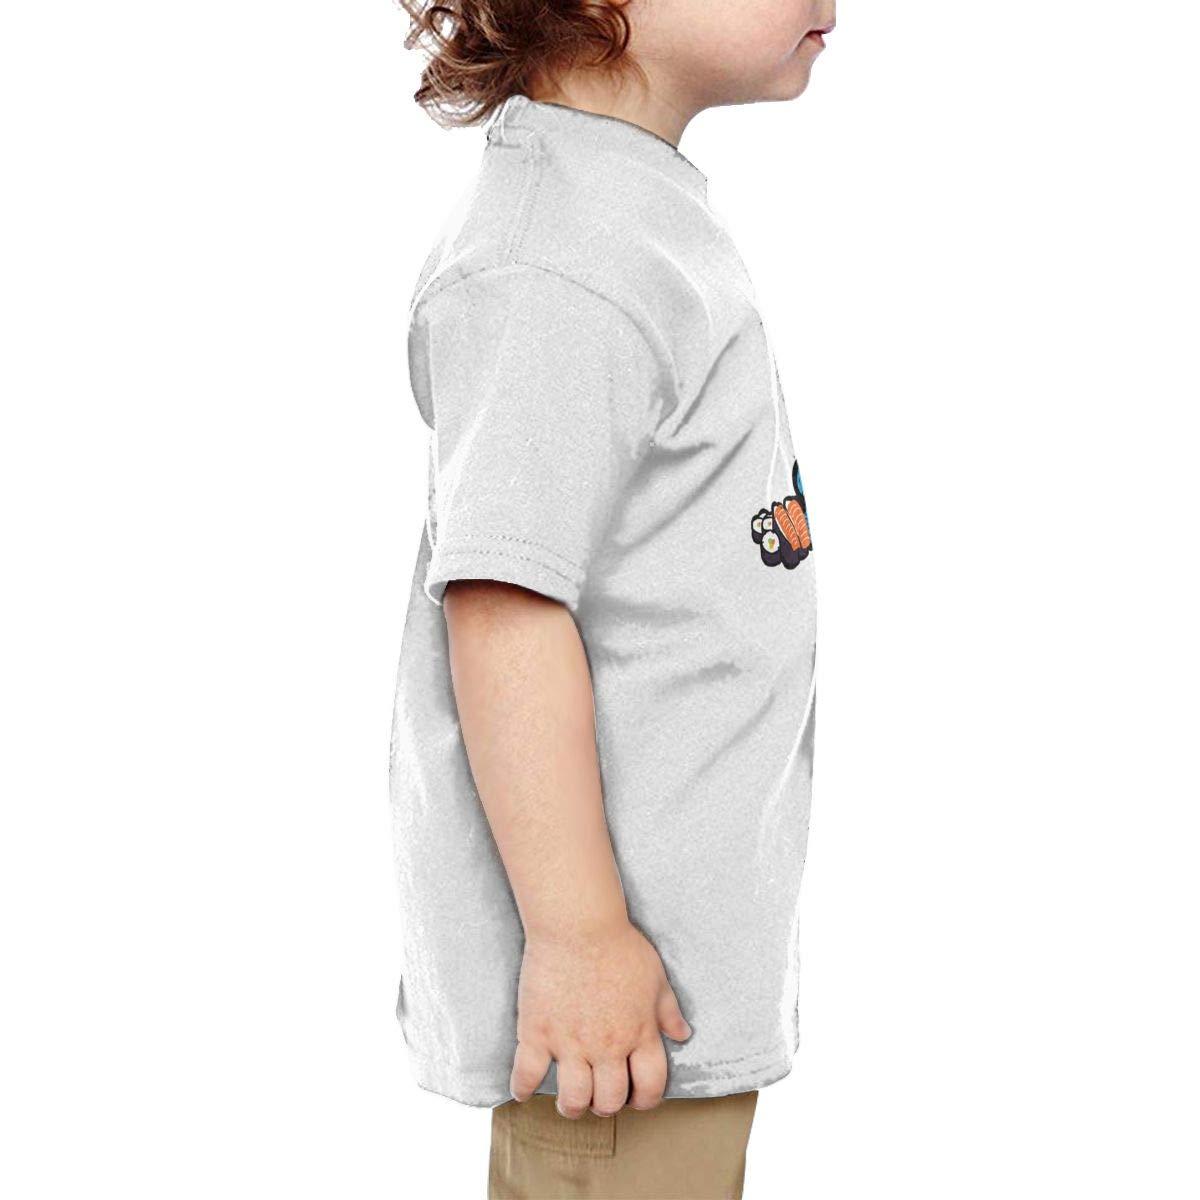 I Love Sushi Baby Toddler Short Sleeve Crewneck Cotton Tee